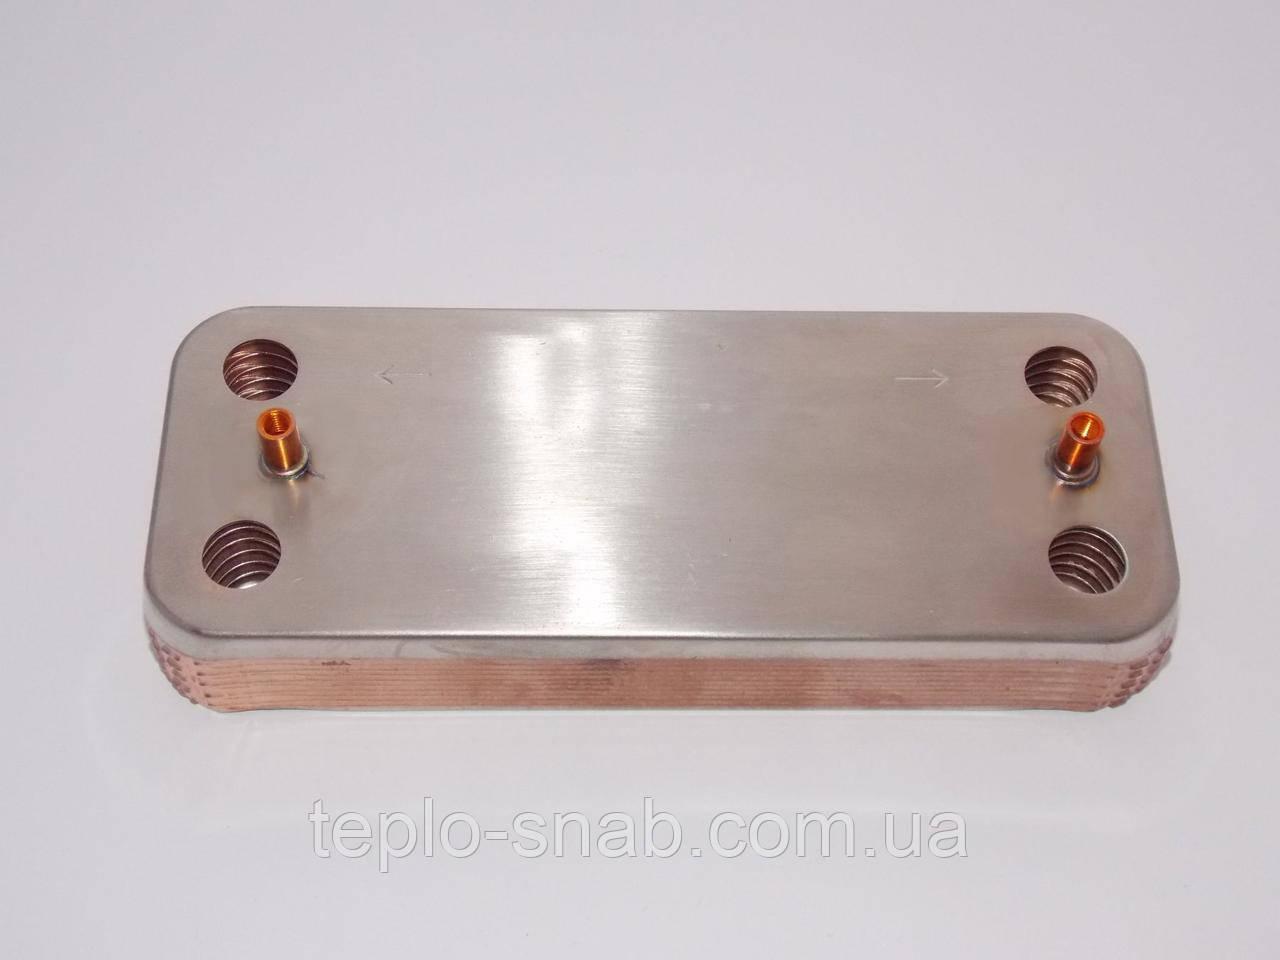 Теплообменник вторичный Zoom Master BF/Expert BF 18-24 kw (FUGAS), Solly Primer, Grandini D324 - B2 12 пл. Aa10110001